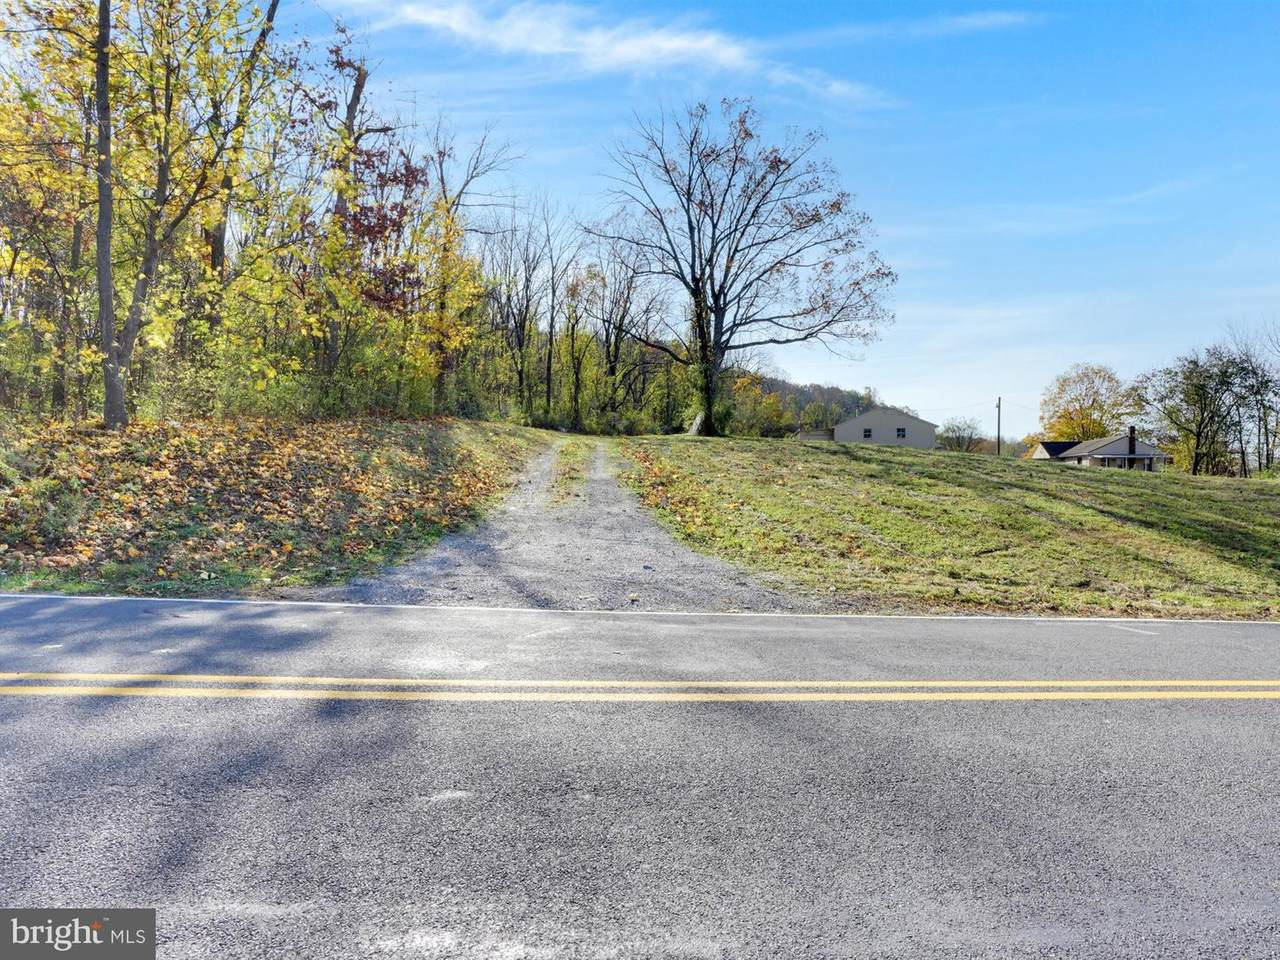 5819 Route 61 - Photo 1